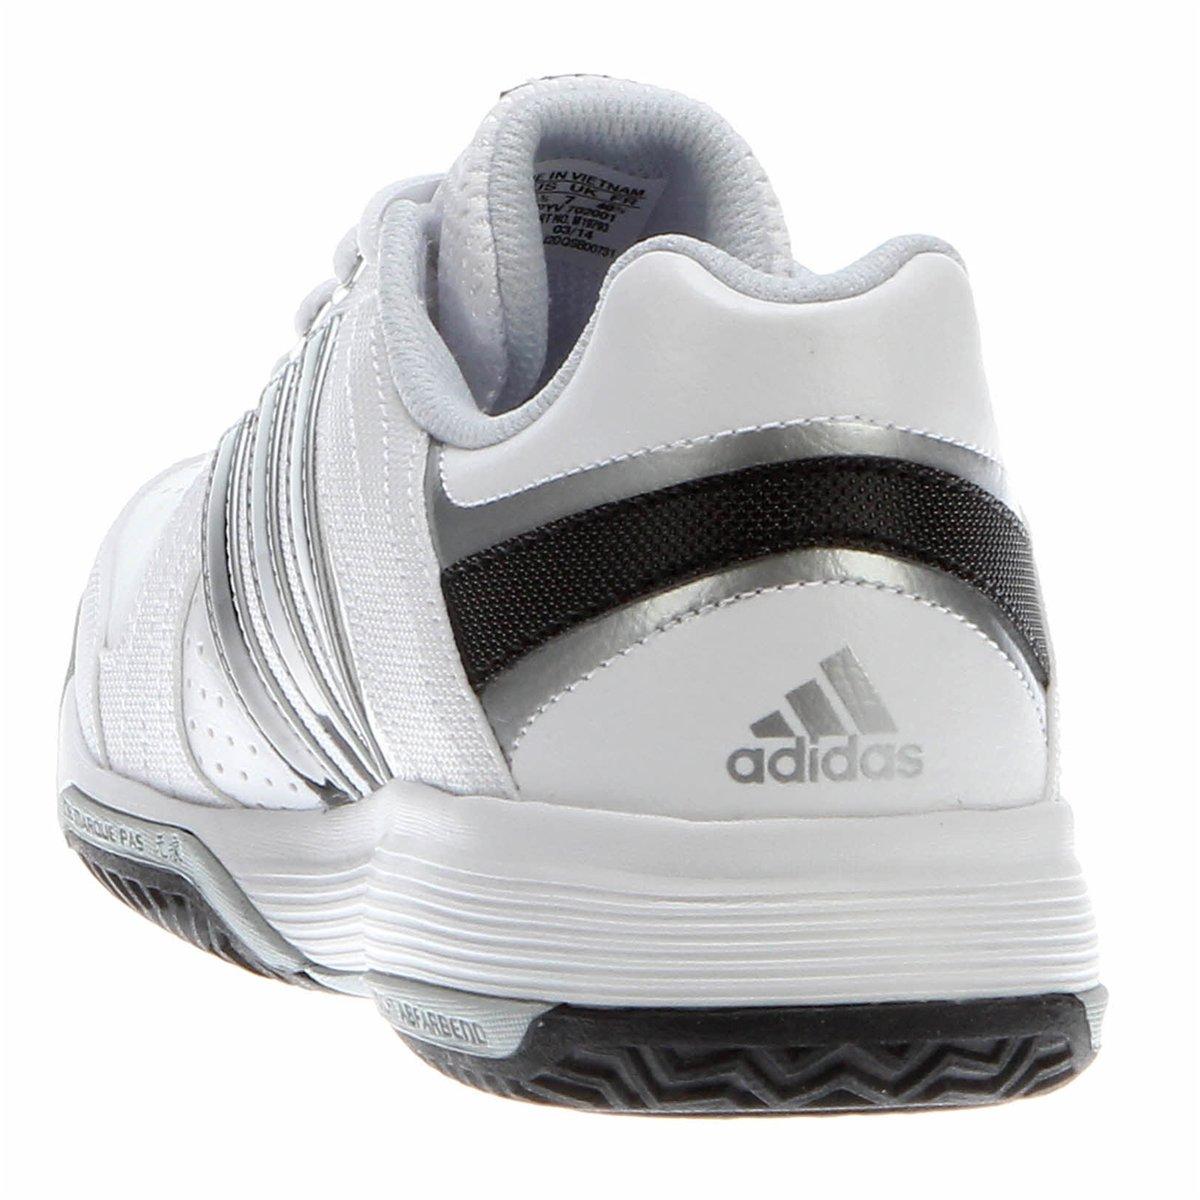 Tênis Adidas Ambition Approach - Compre Agora  bbb15a77e6747